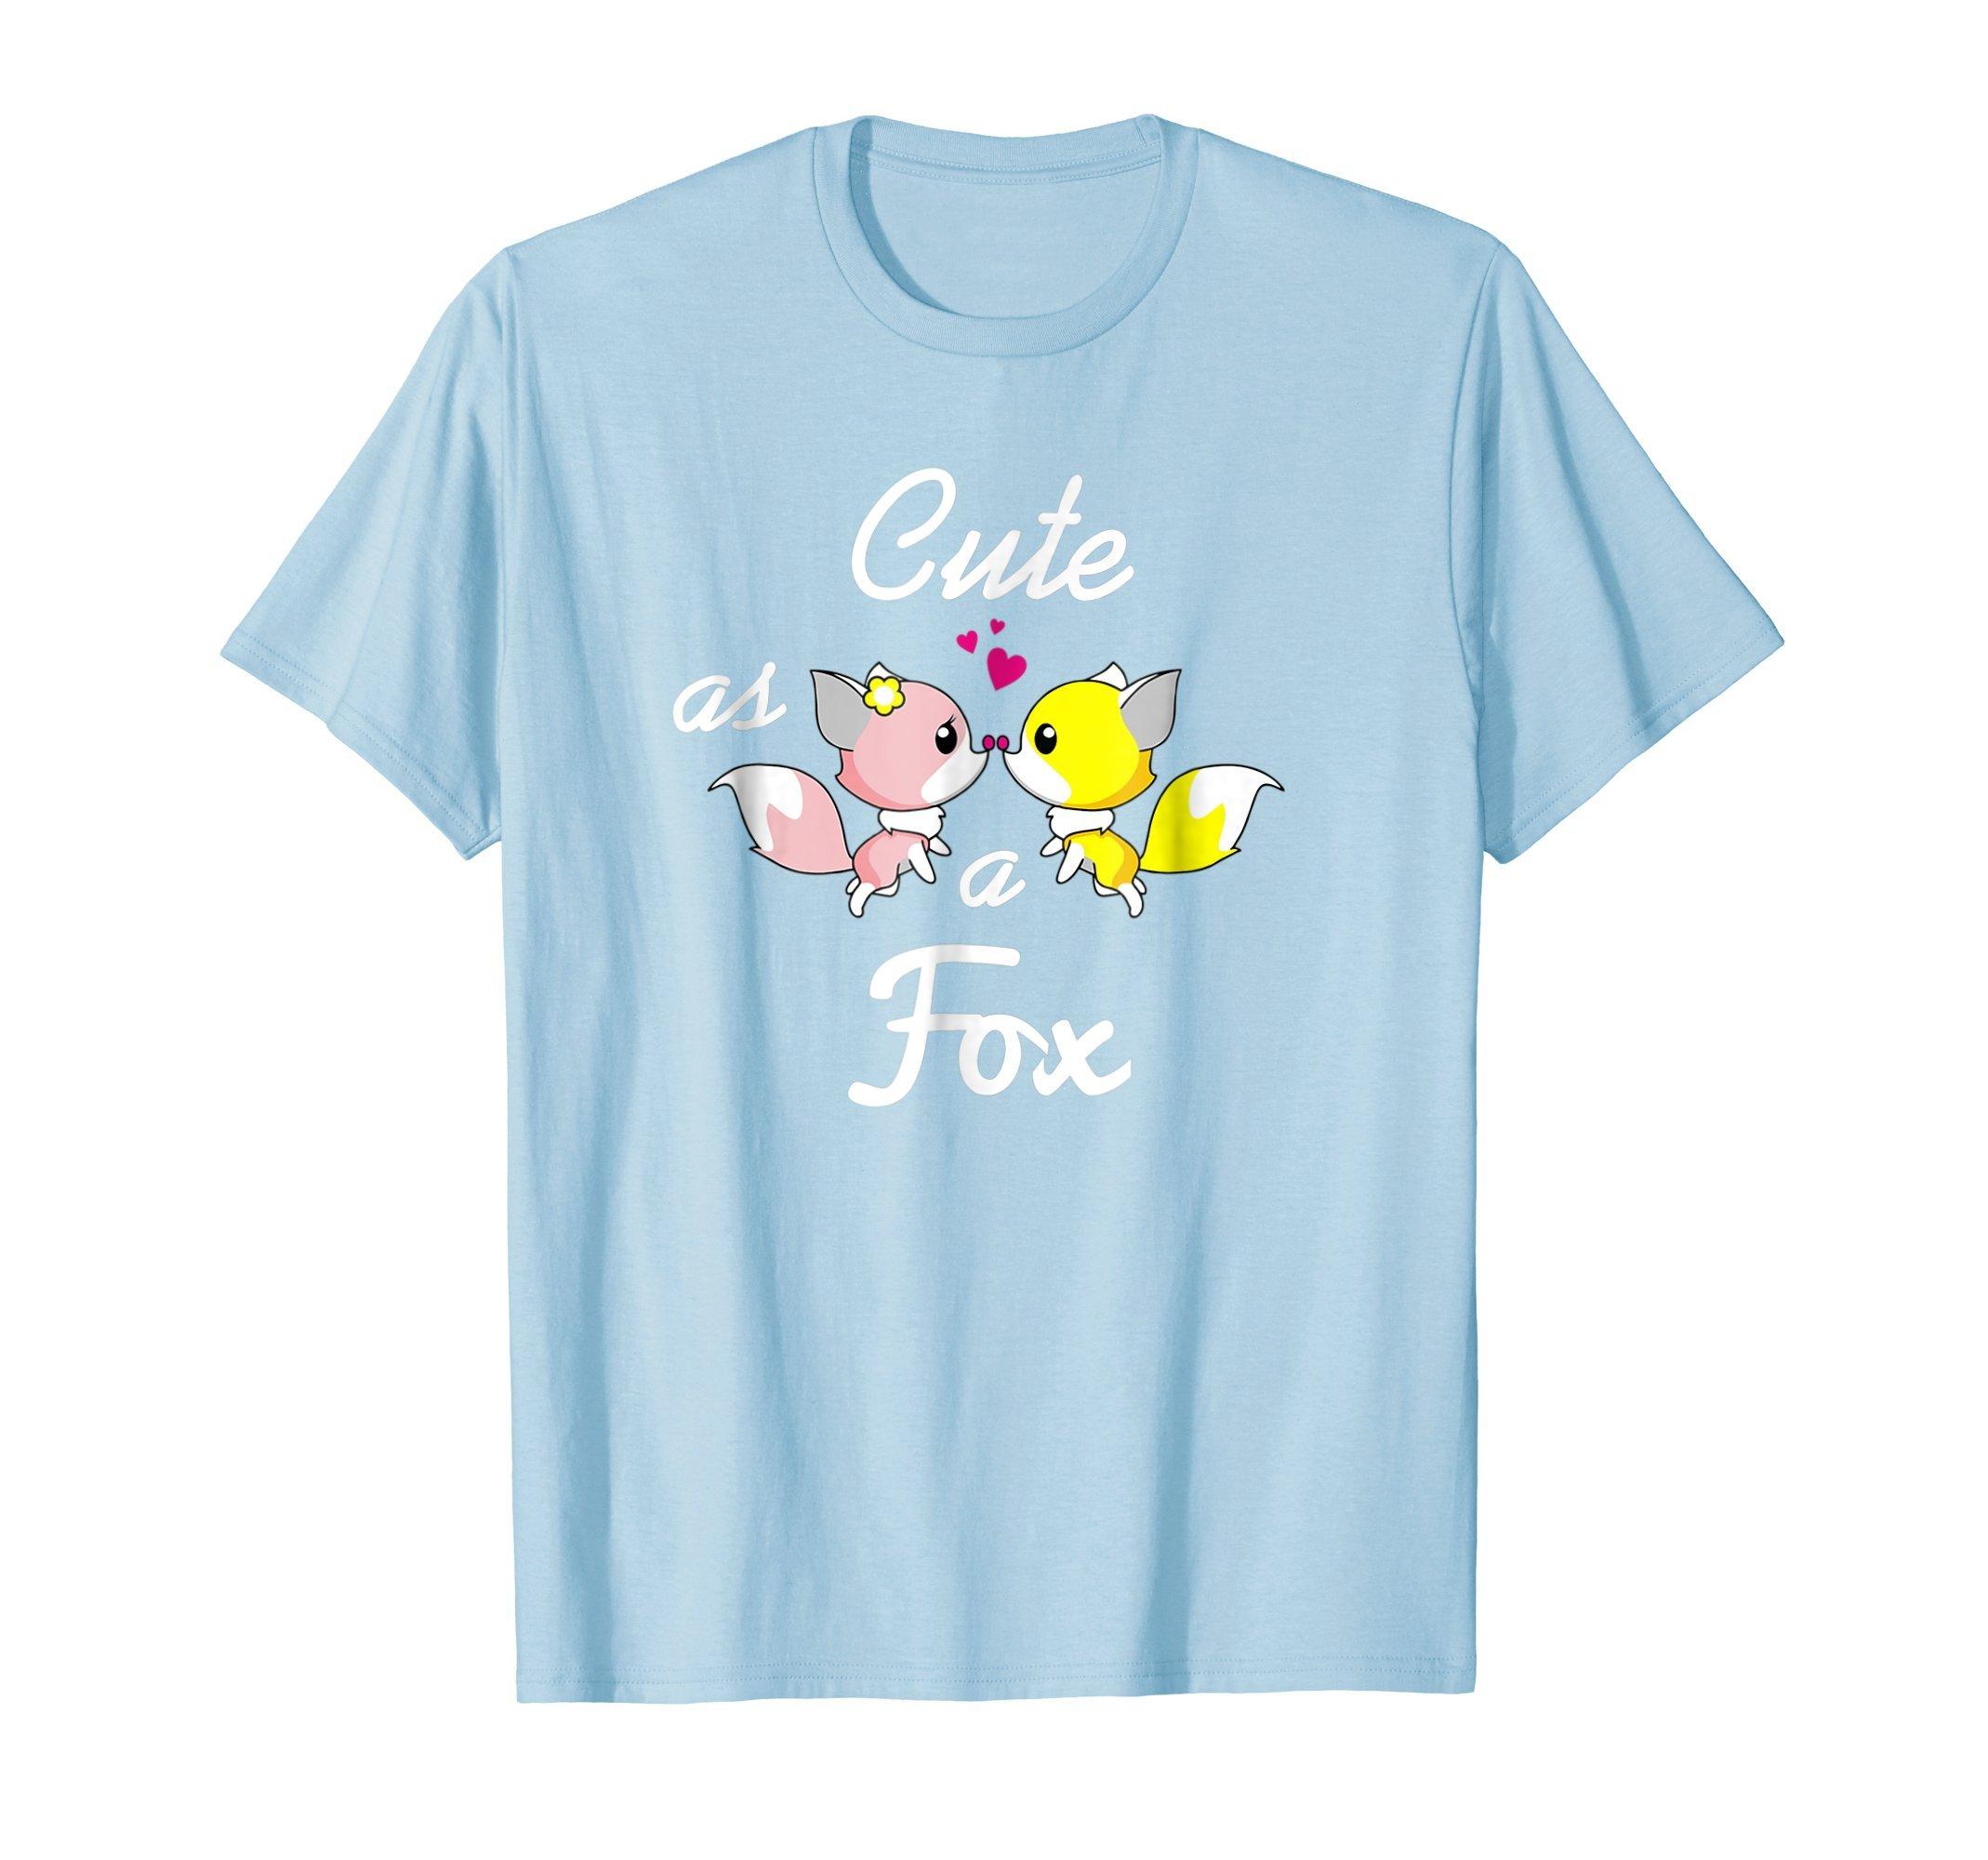 Cute Fox T-Shirt Love Foxes Pink and Yellow Fox Shirt